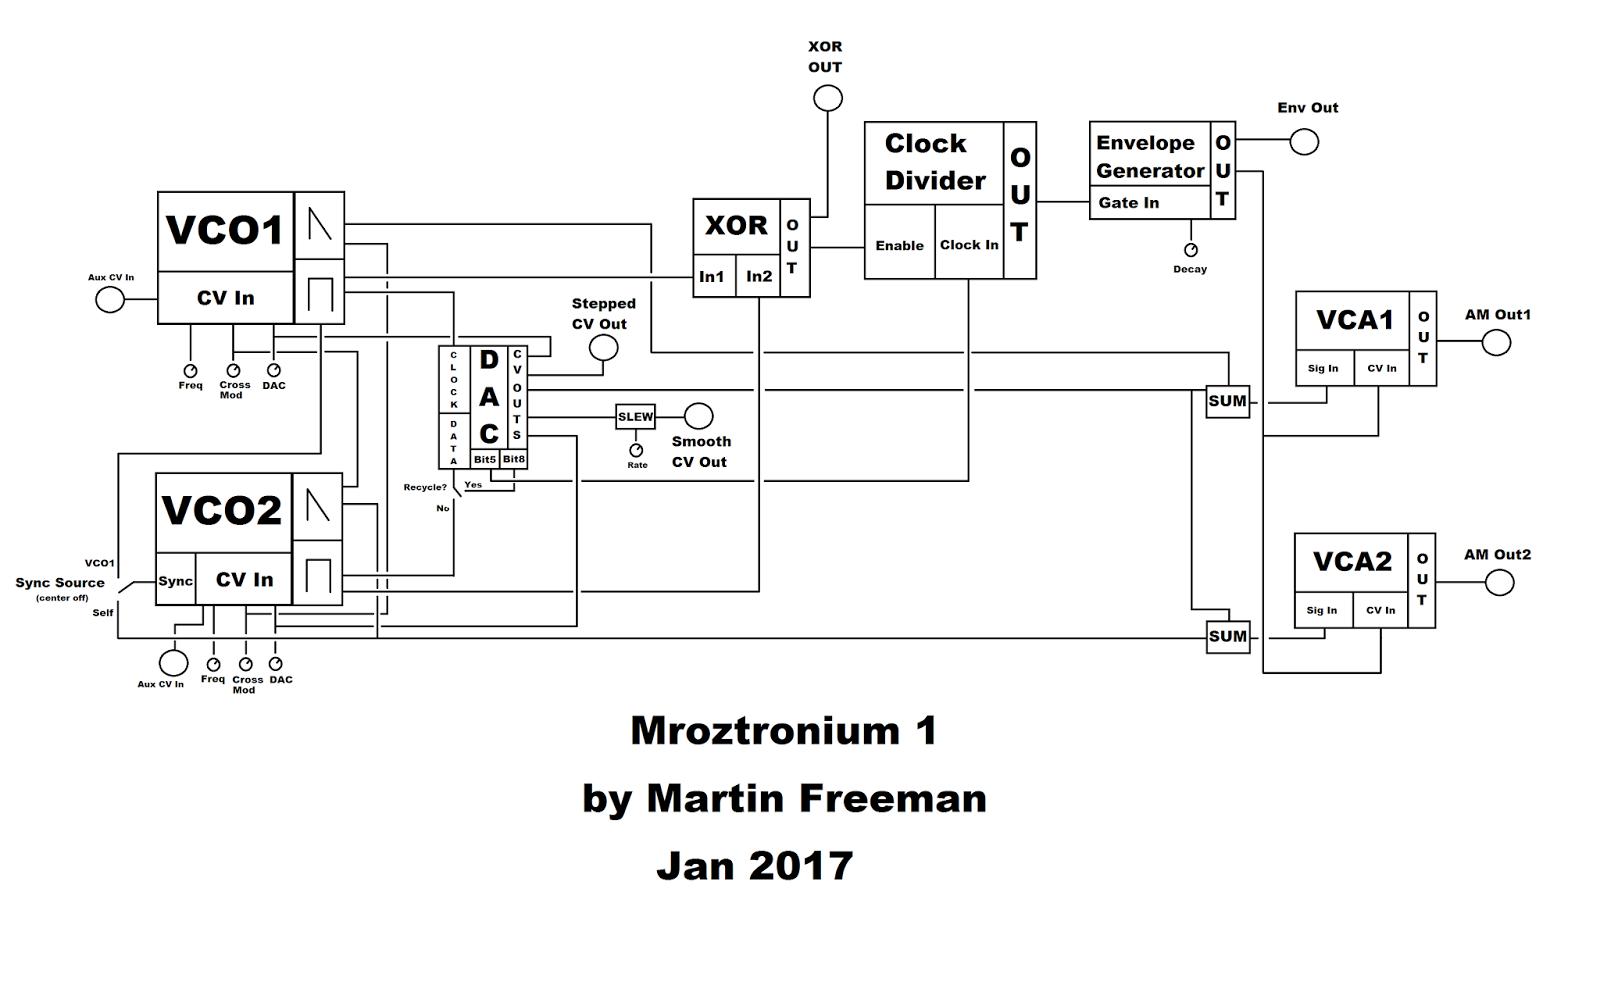 Mroztronium: Mroztronium 1